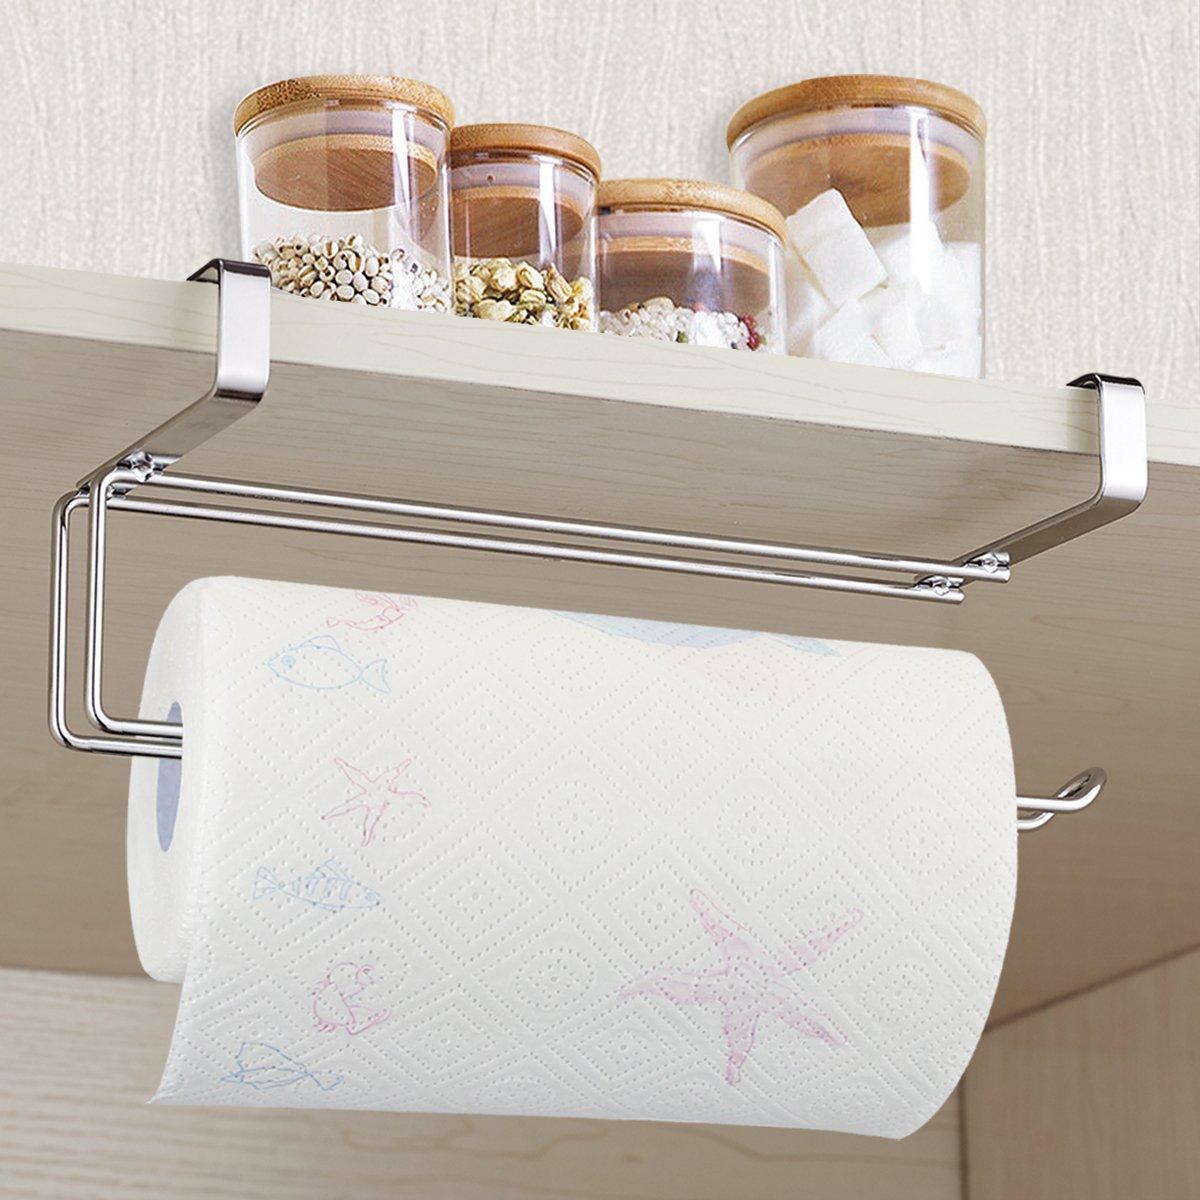 Paper Towel Holder, Aiduy Hanging Paper Towel Holder Under Cabinet Paper Towel Rack Hanger Over the Door Kitchen Roll Holder, Stainless Steel